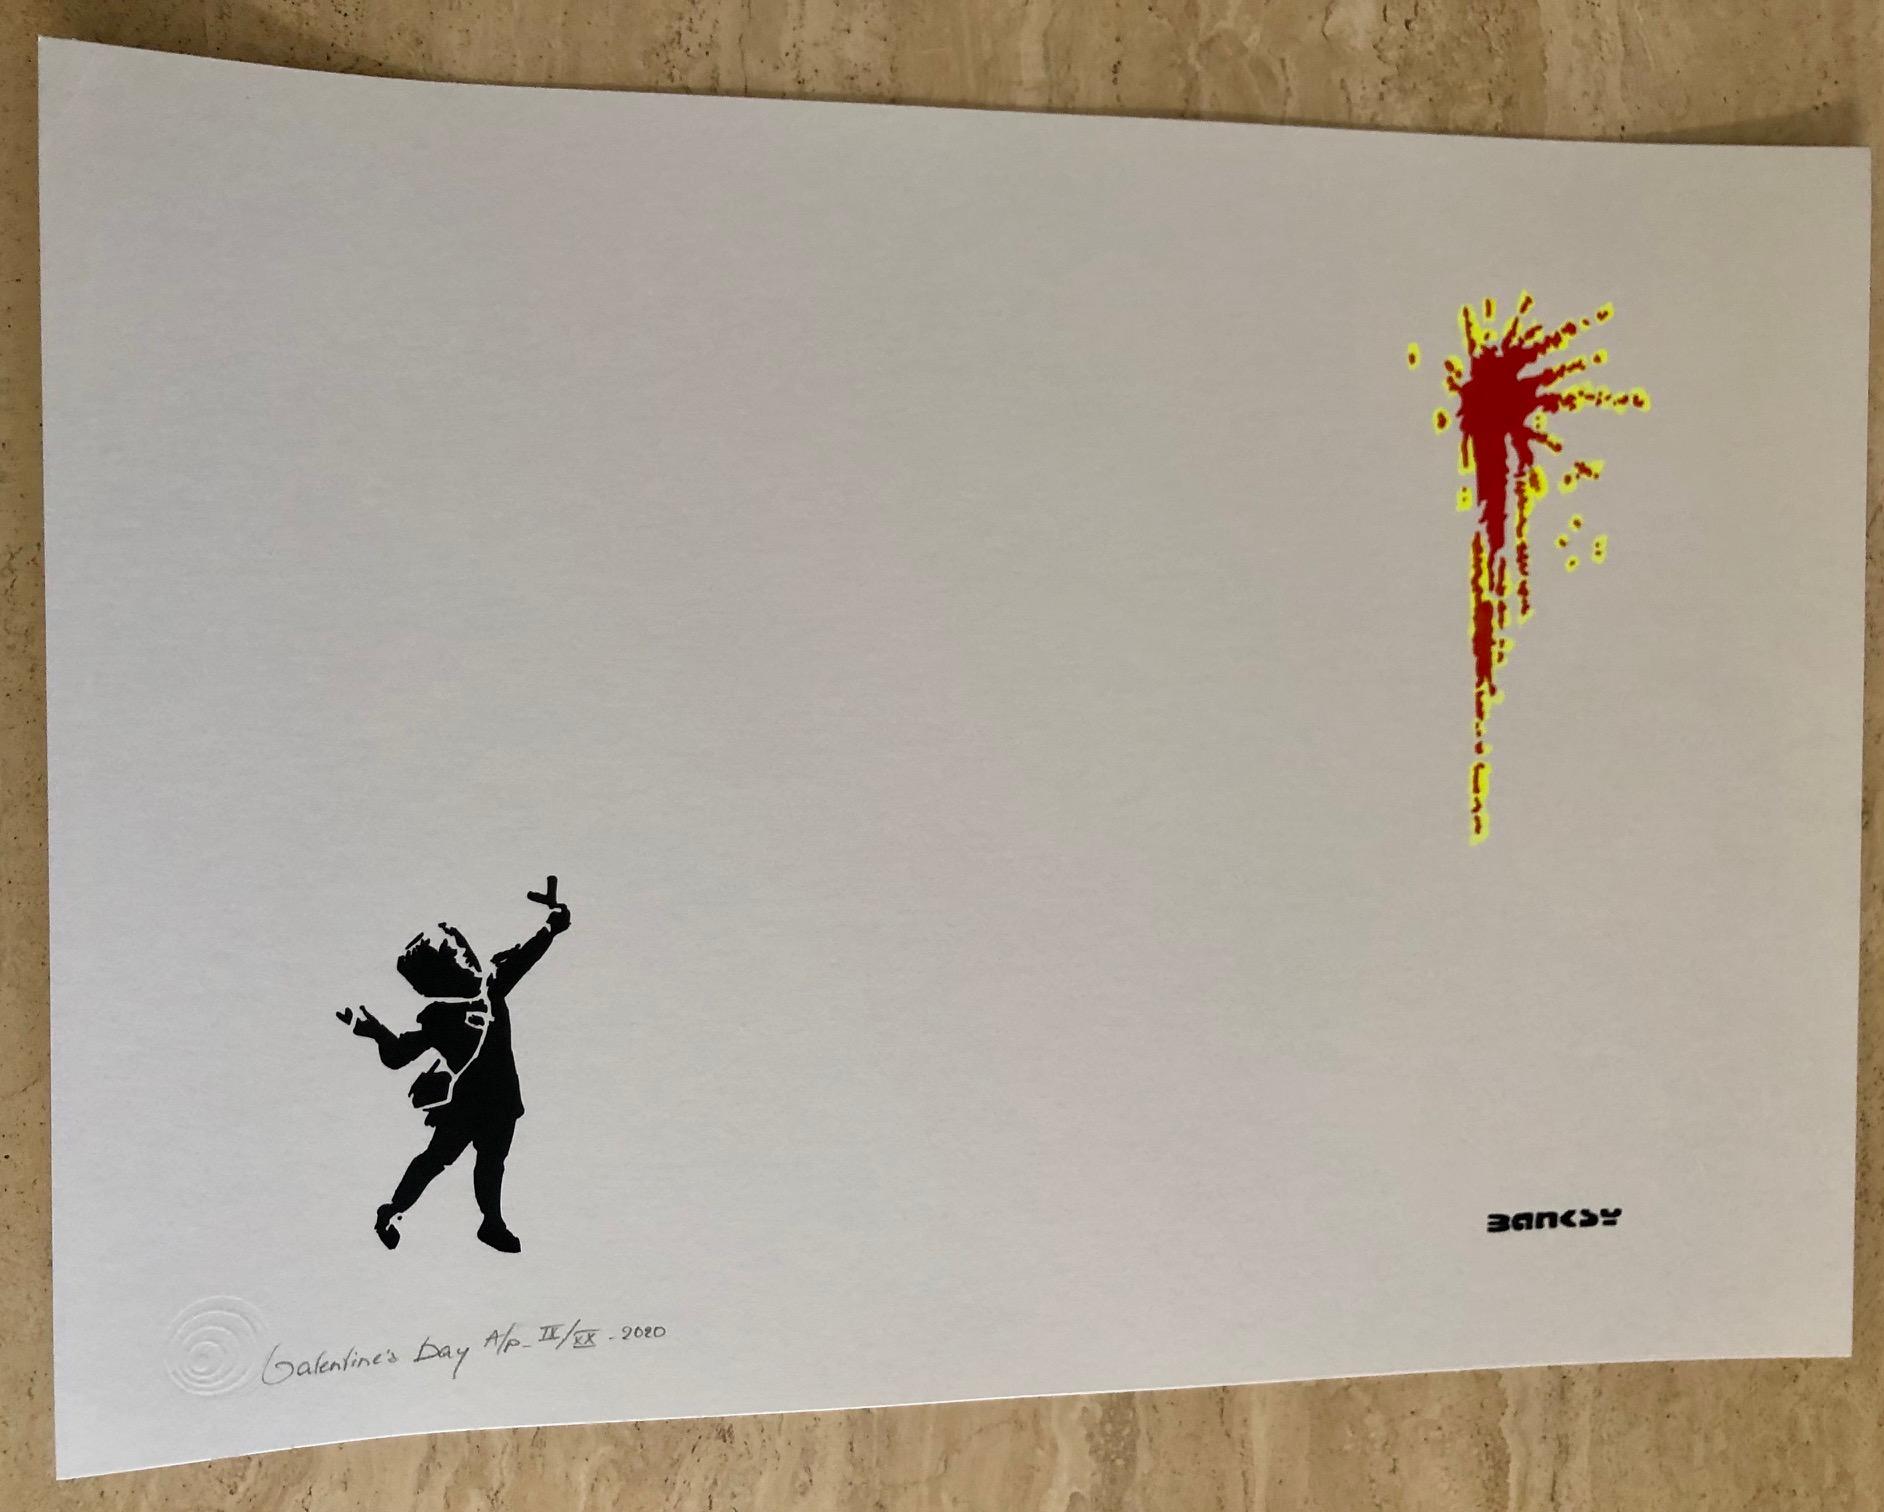 Valentine's Day by   Banksy - Masterpiece Online